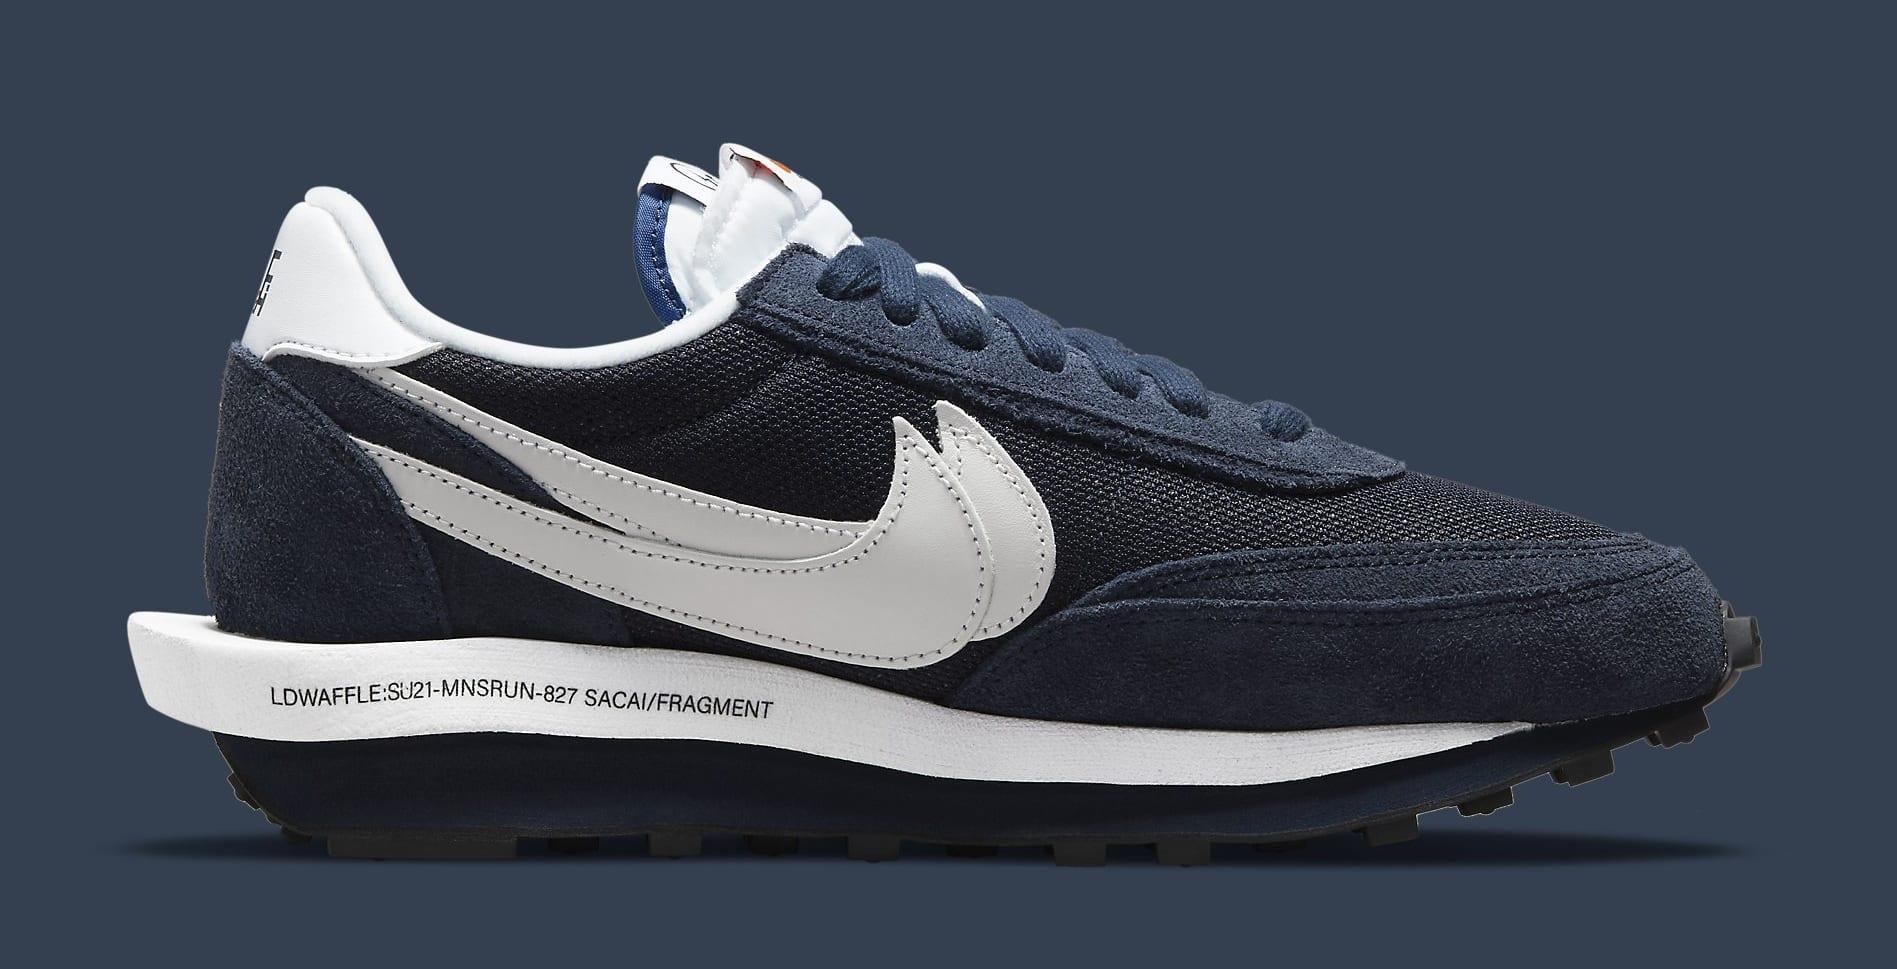 Fragment x Sacai x Nike LDWaffle 'Blackened Blue' DH2684-400 Medial